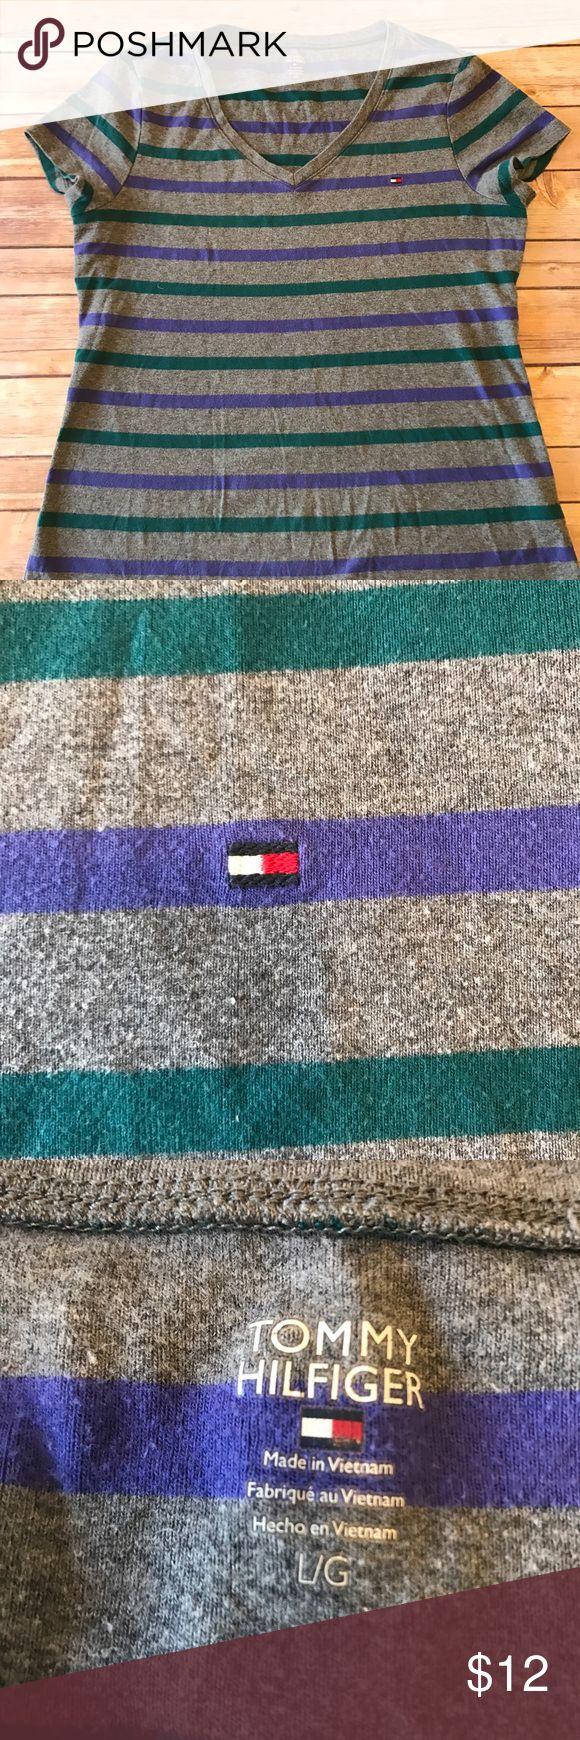 Tommy Hilfiger Women's V- Neck T- Shirt Tommy Hilfiger Women's V- Neck T- Shirt Short Sleeve Stripes Shirt  •VNeck Shirt •Striped •tommy Hillfiger Symbol on shirt •Grey/Purple/Green •Tshirt •Soft Tommy Hilfiger Tops Tees - Short Sleeve